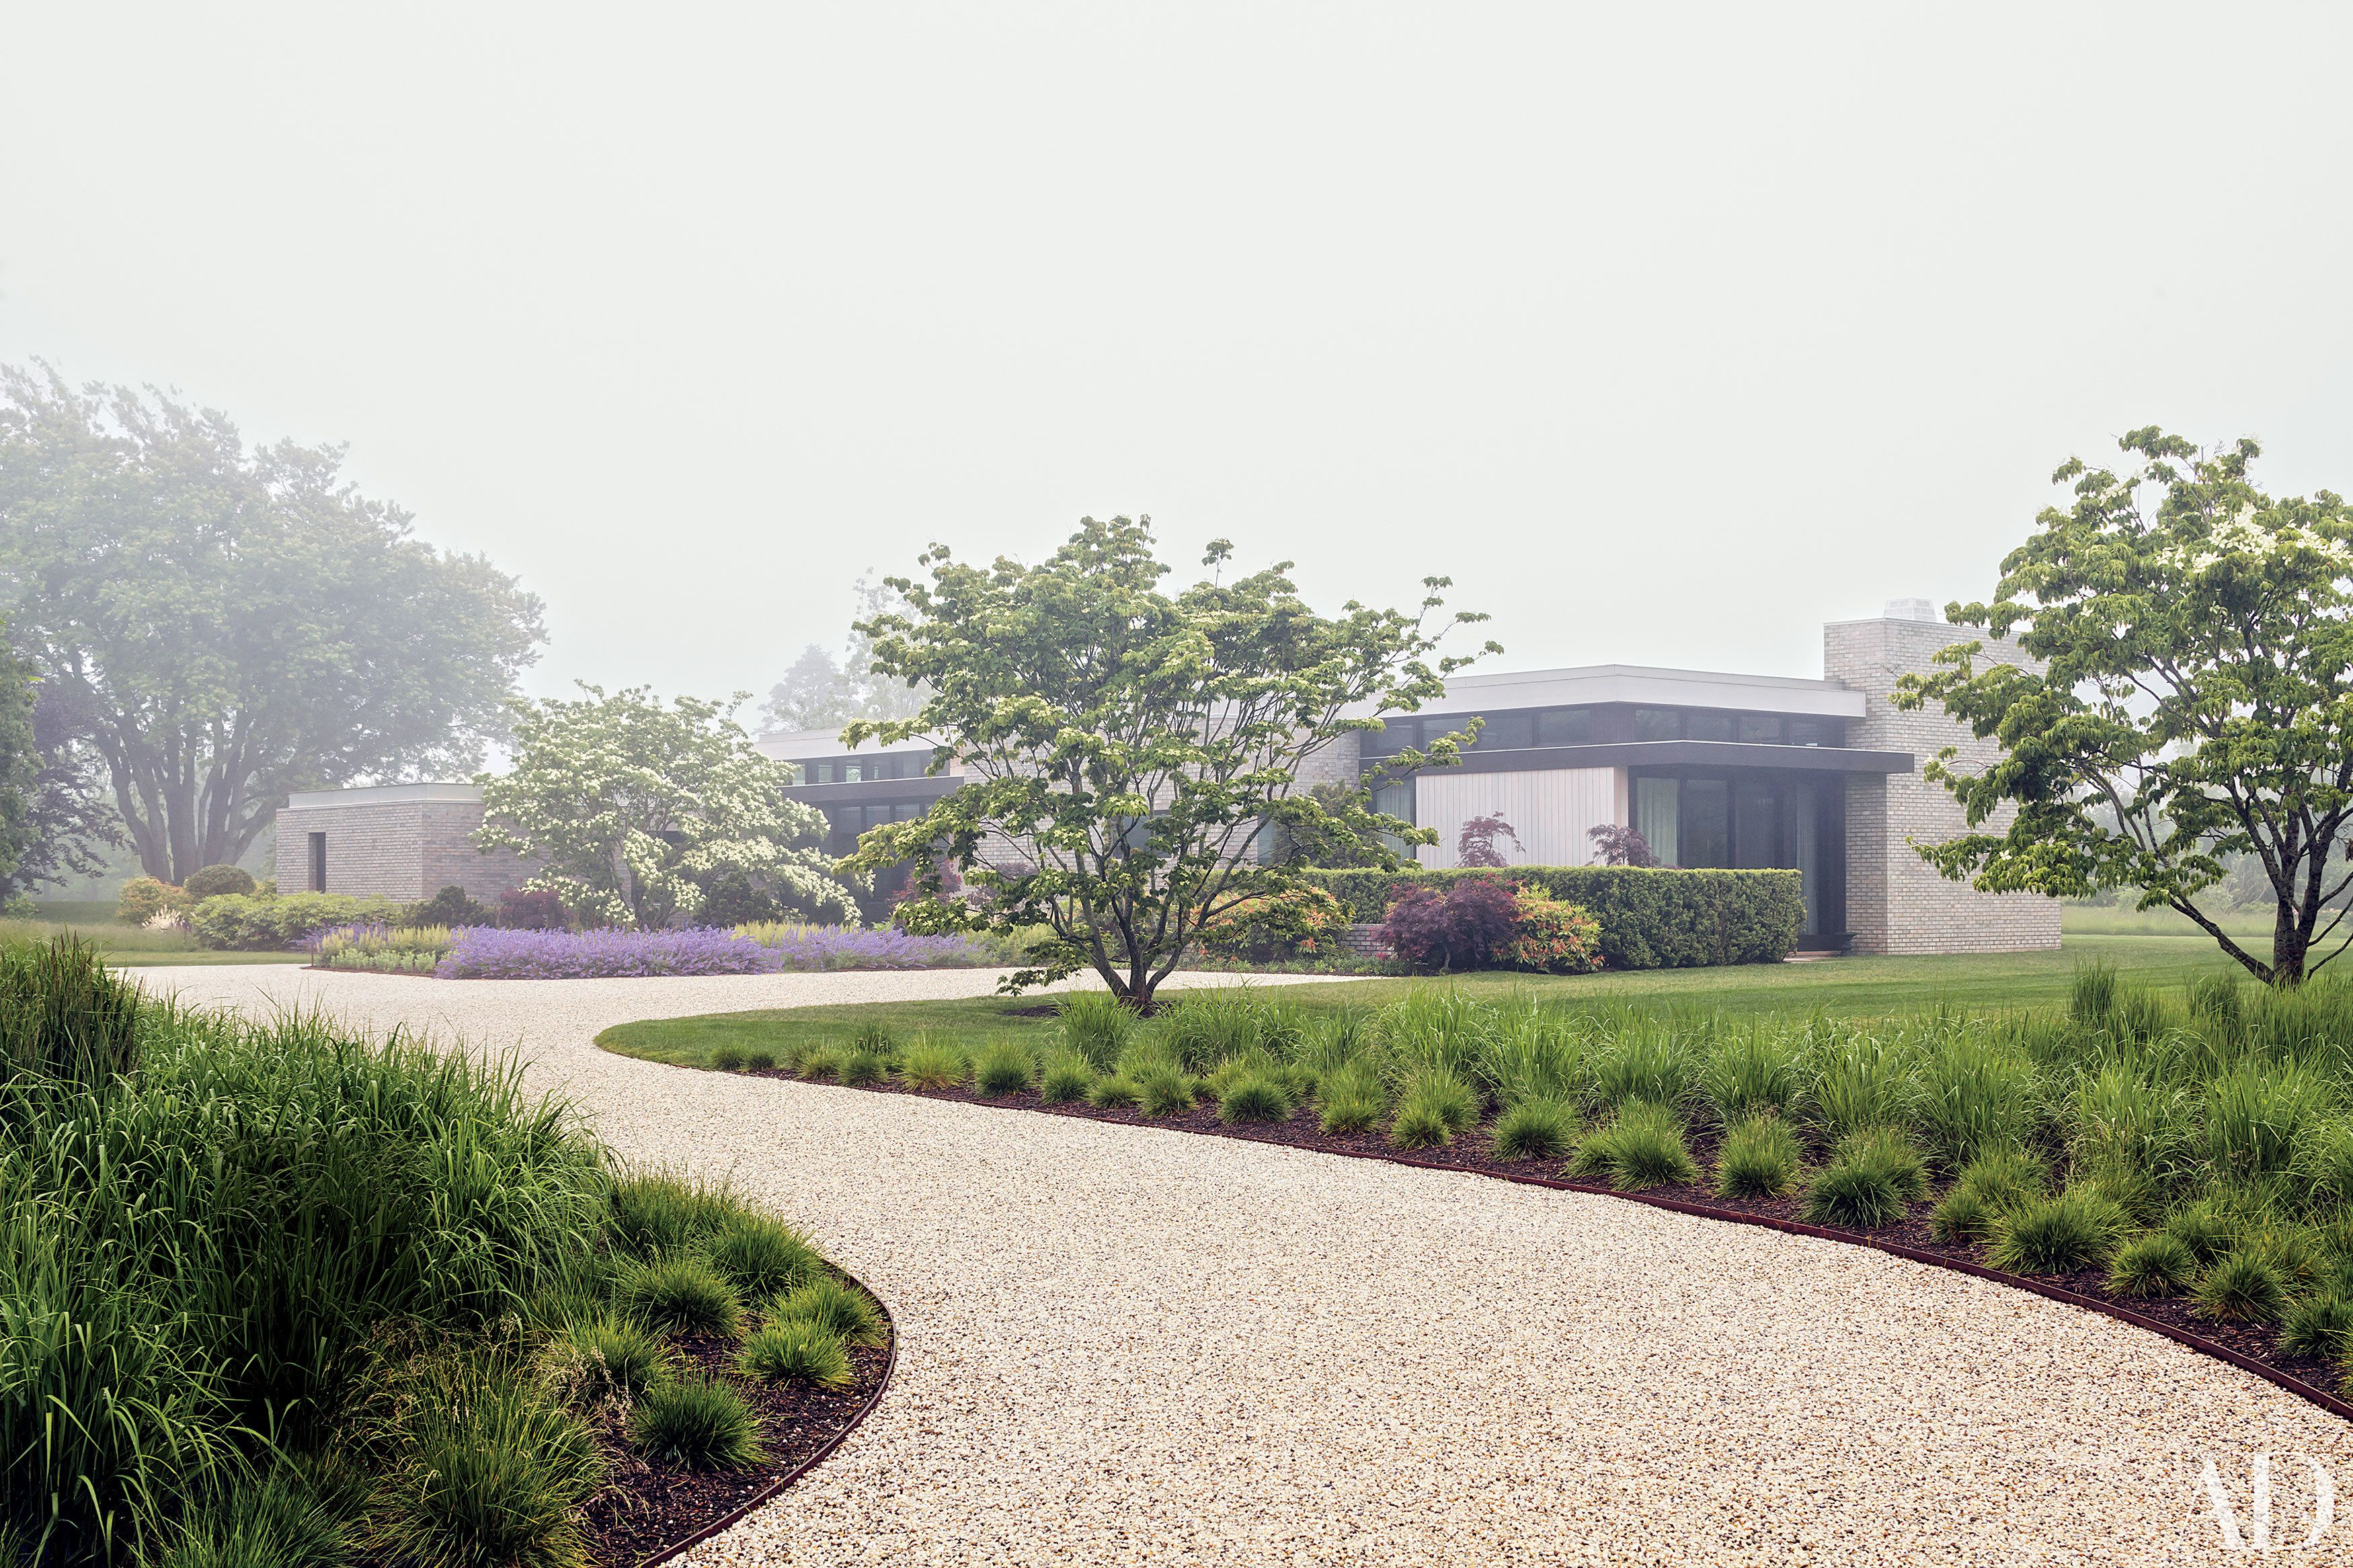 52 Beautifully Landscaped Home Gardens | Pinterest | Landscape ...